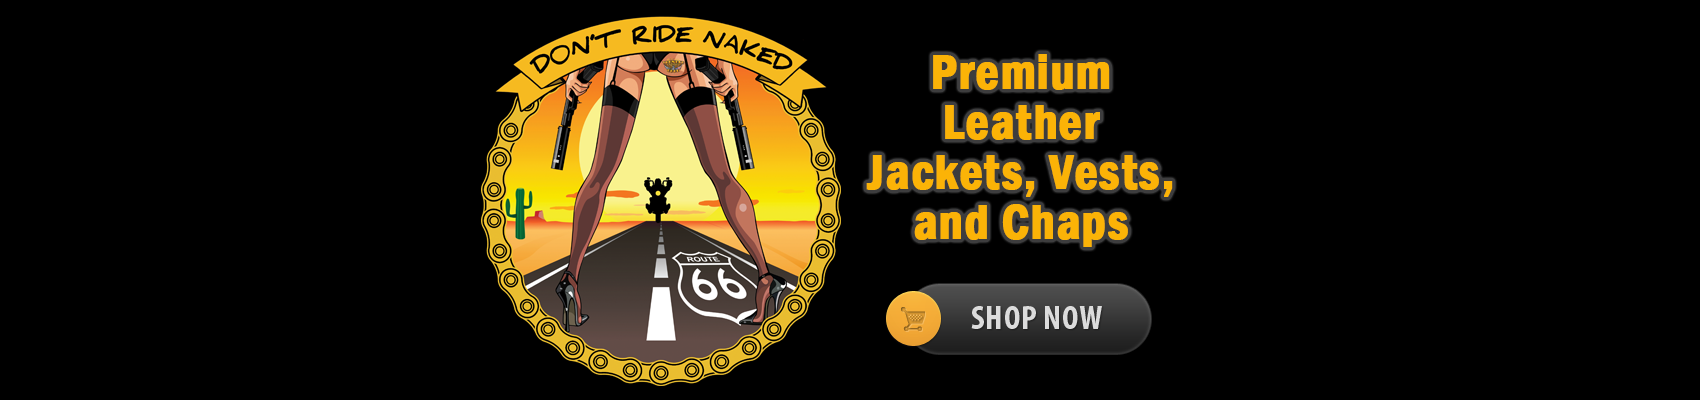 Kingman AZ leather jackets, leather vests, leather chaps